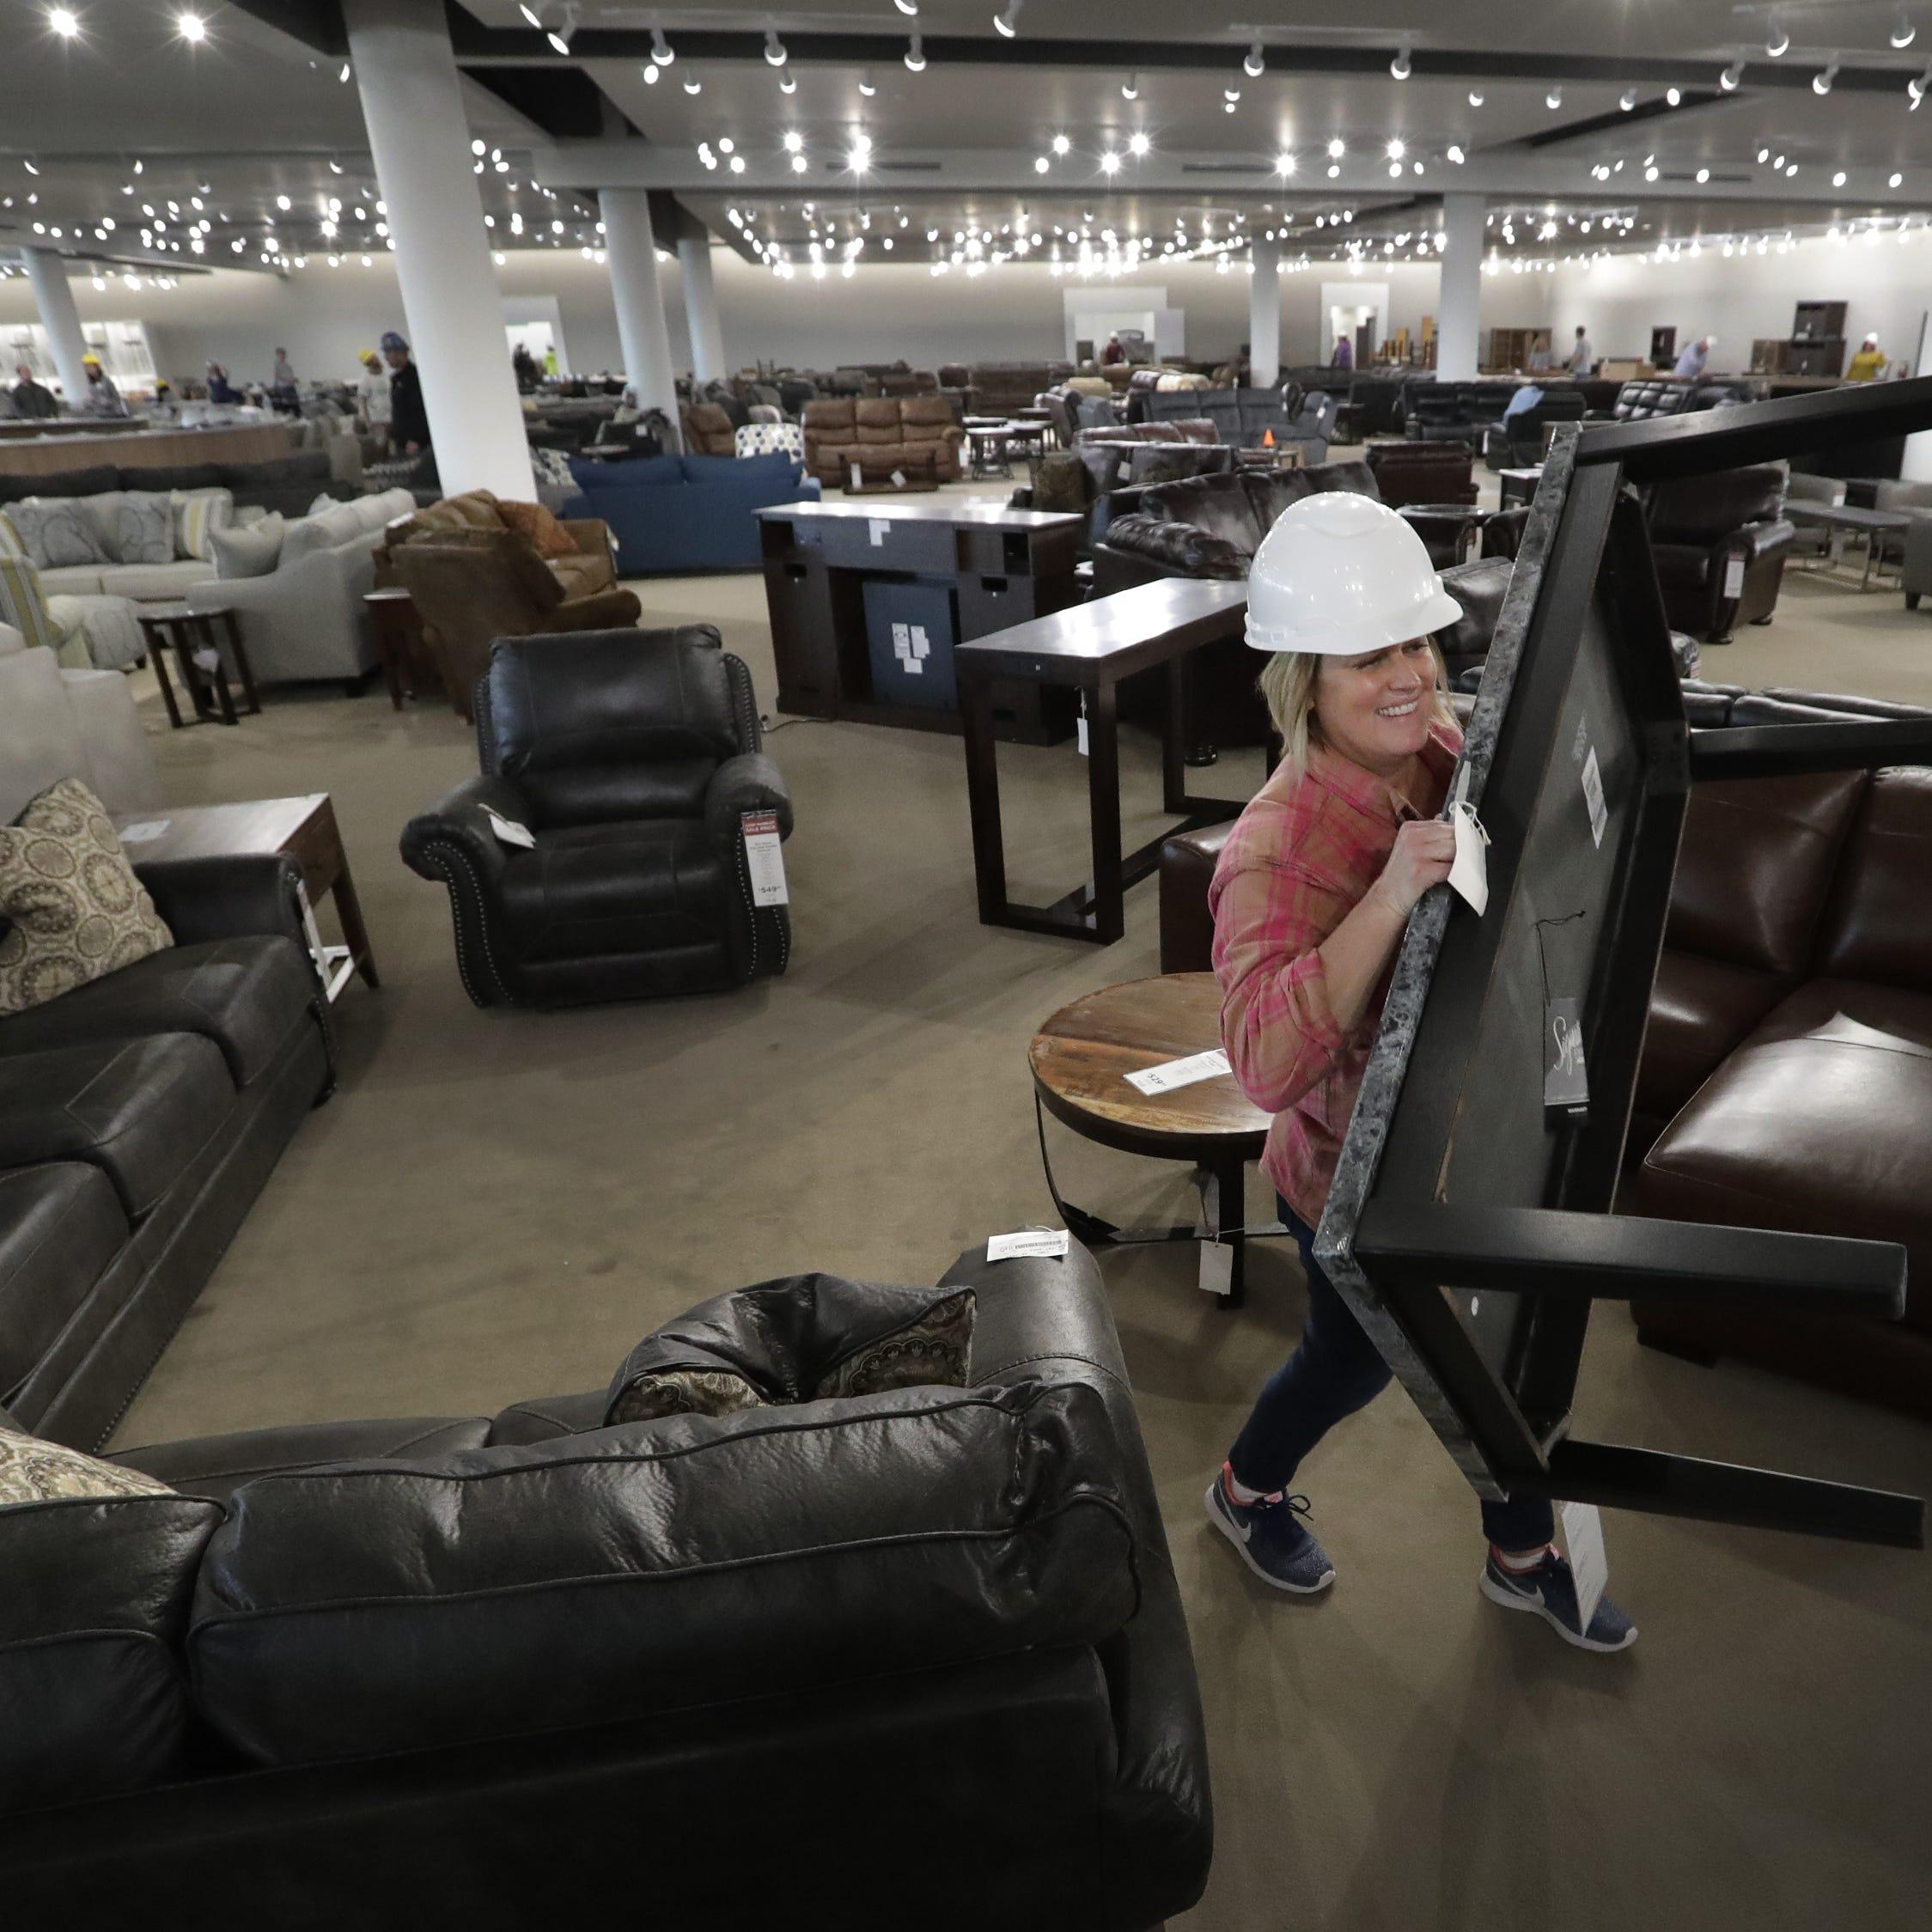 Furnishing the future: WG&R opens Saturday in new Grand Chute store